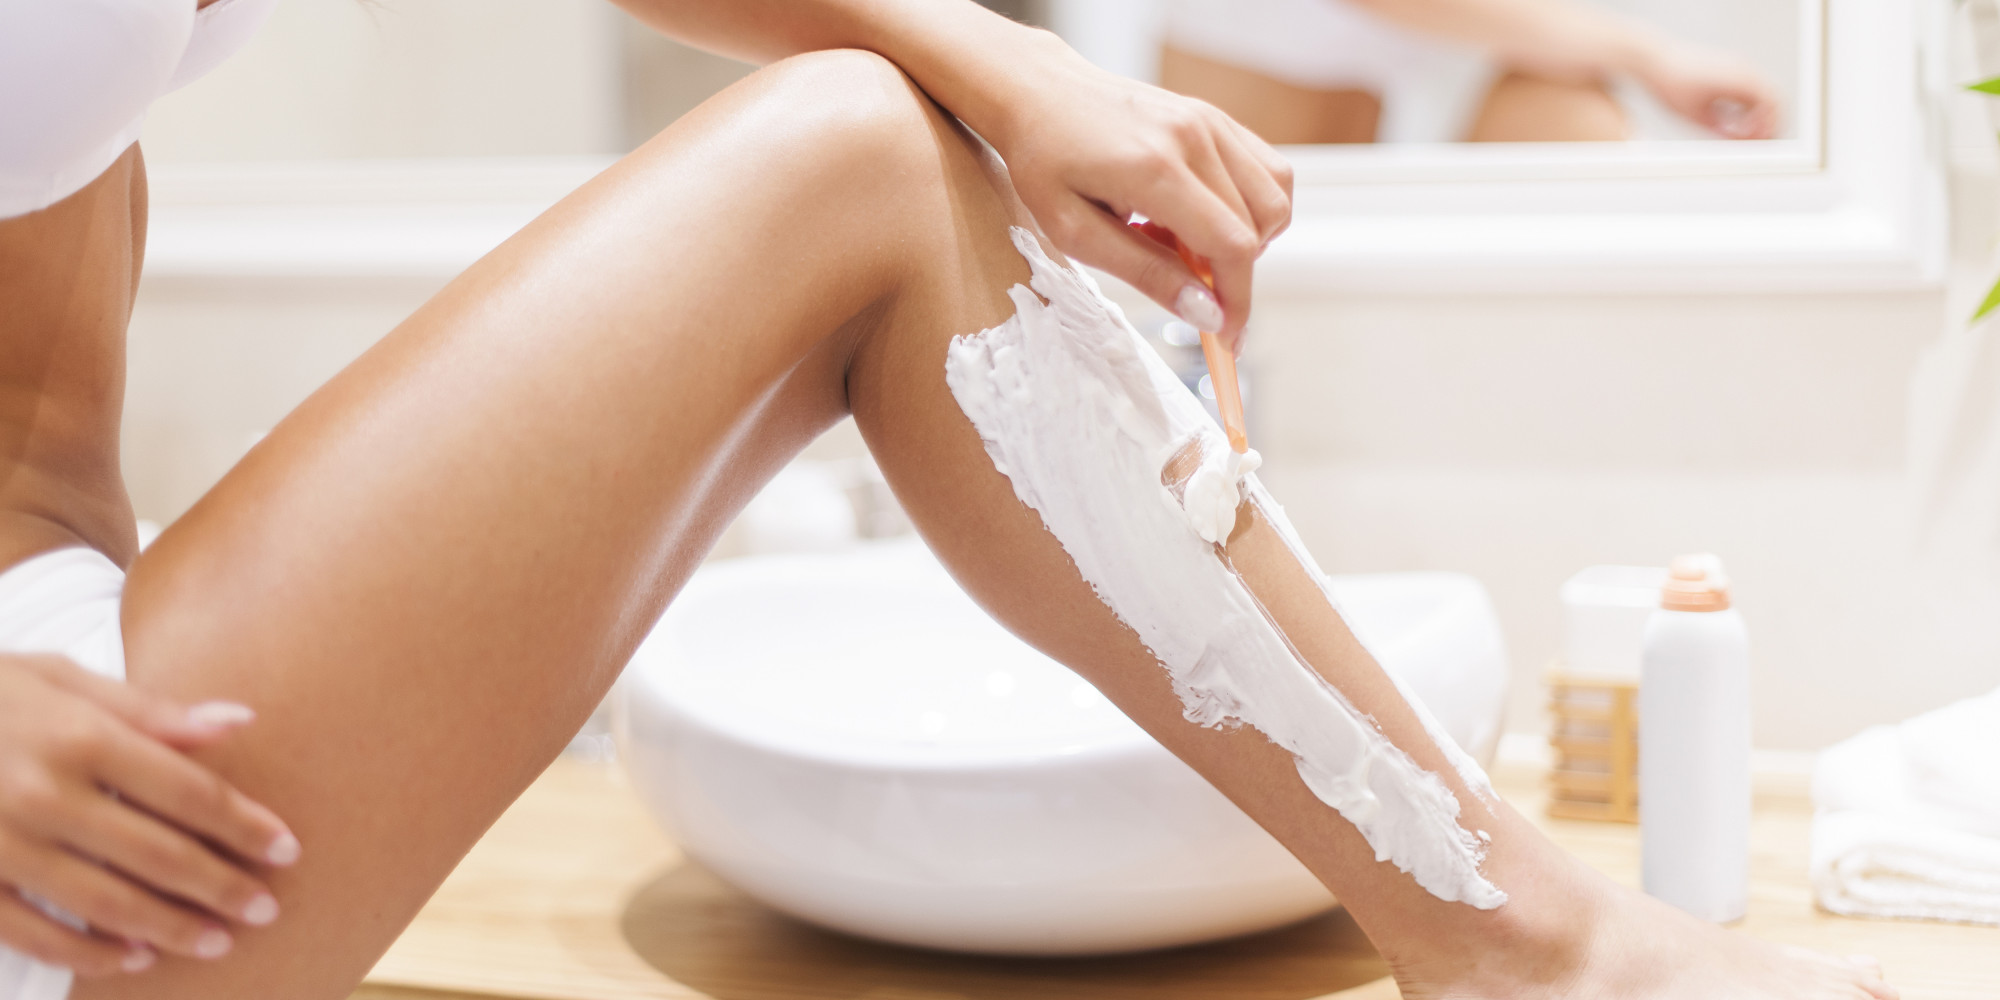 woman-shaving-her-legs